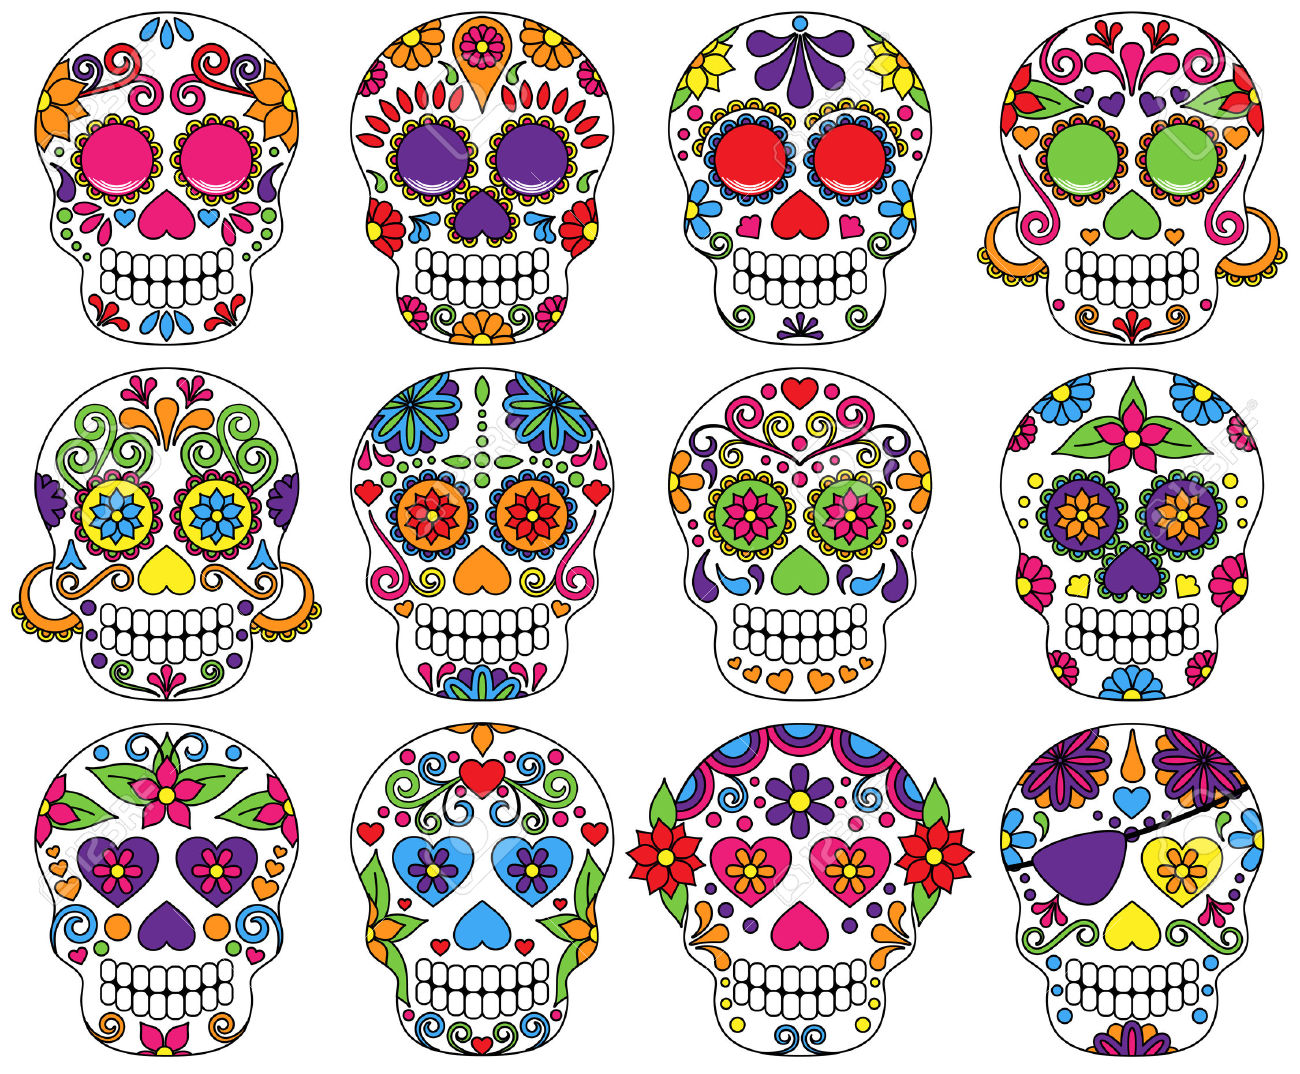 dia de los muertos sugar skull decorating with michele beach store cafe [ 1300 x 1074 Pixel ]